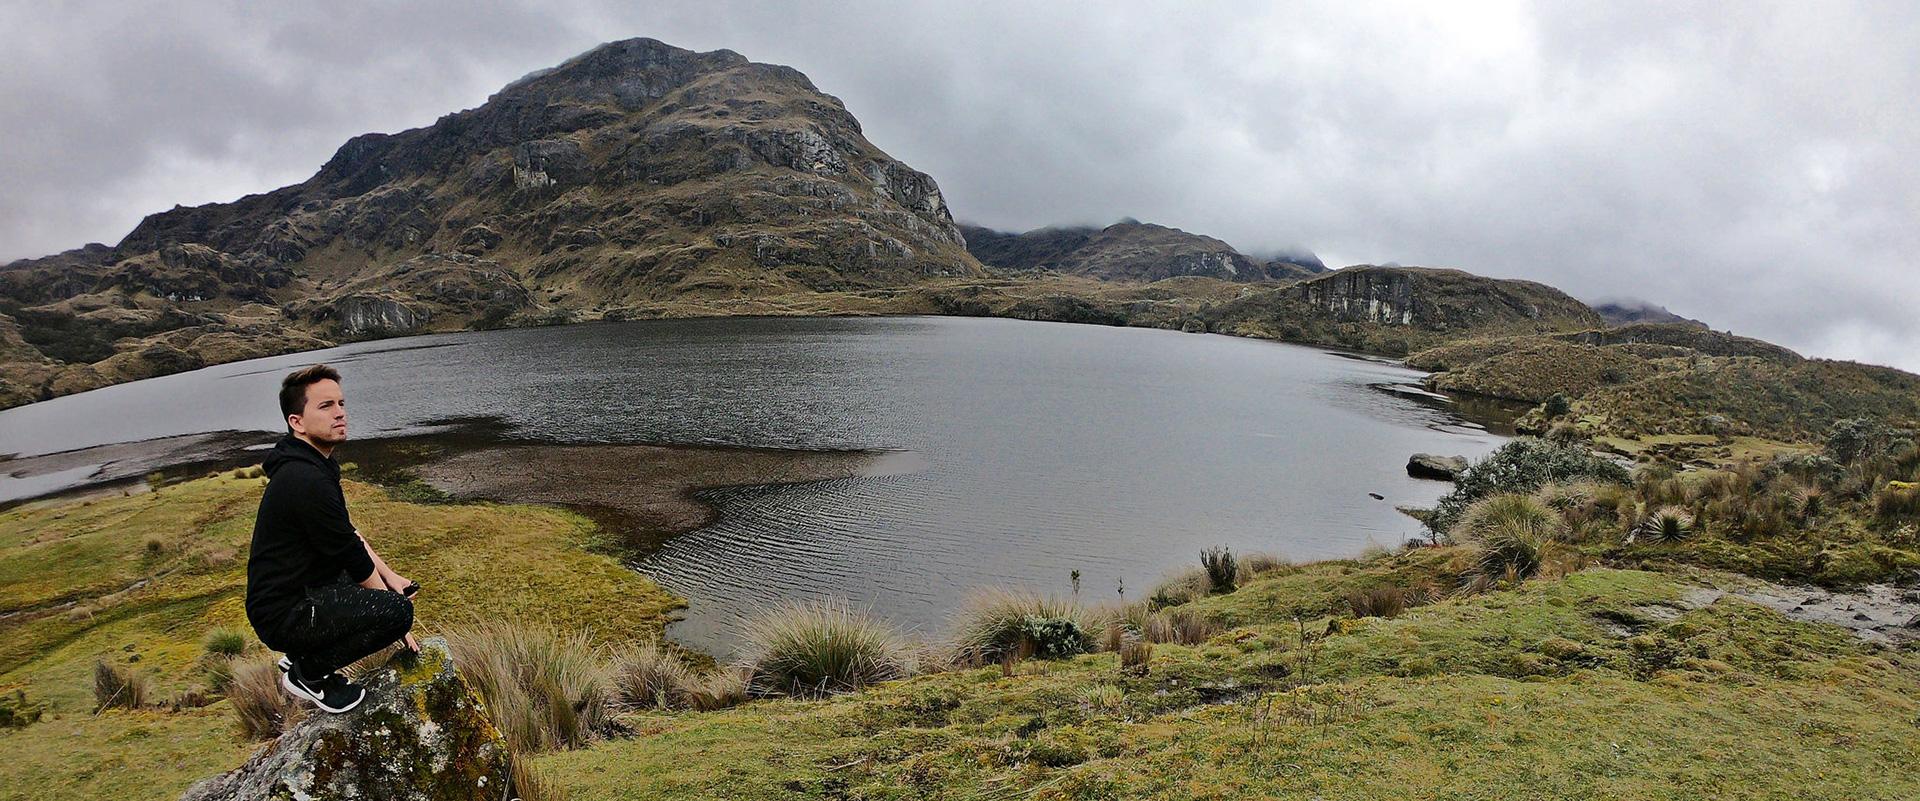 Cajas National Park Landscape Andes